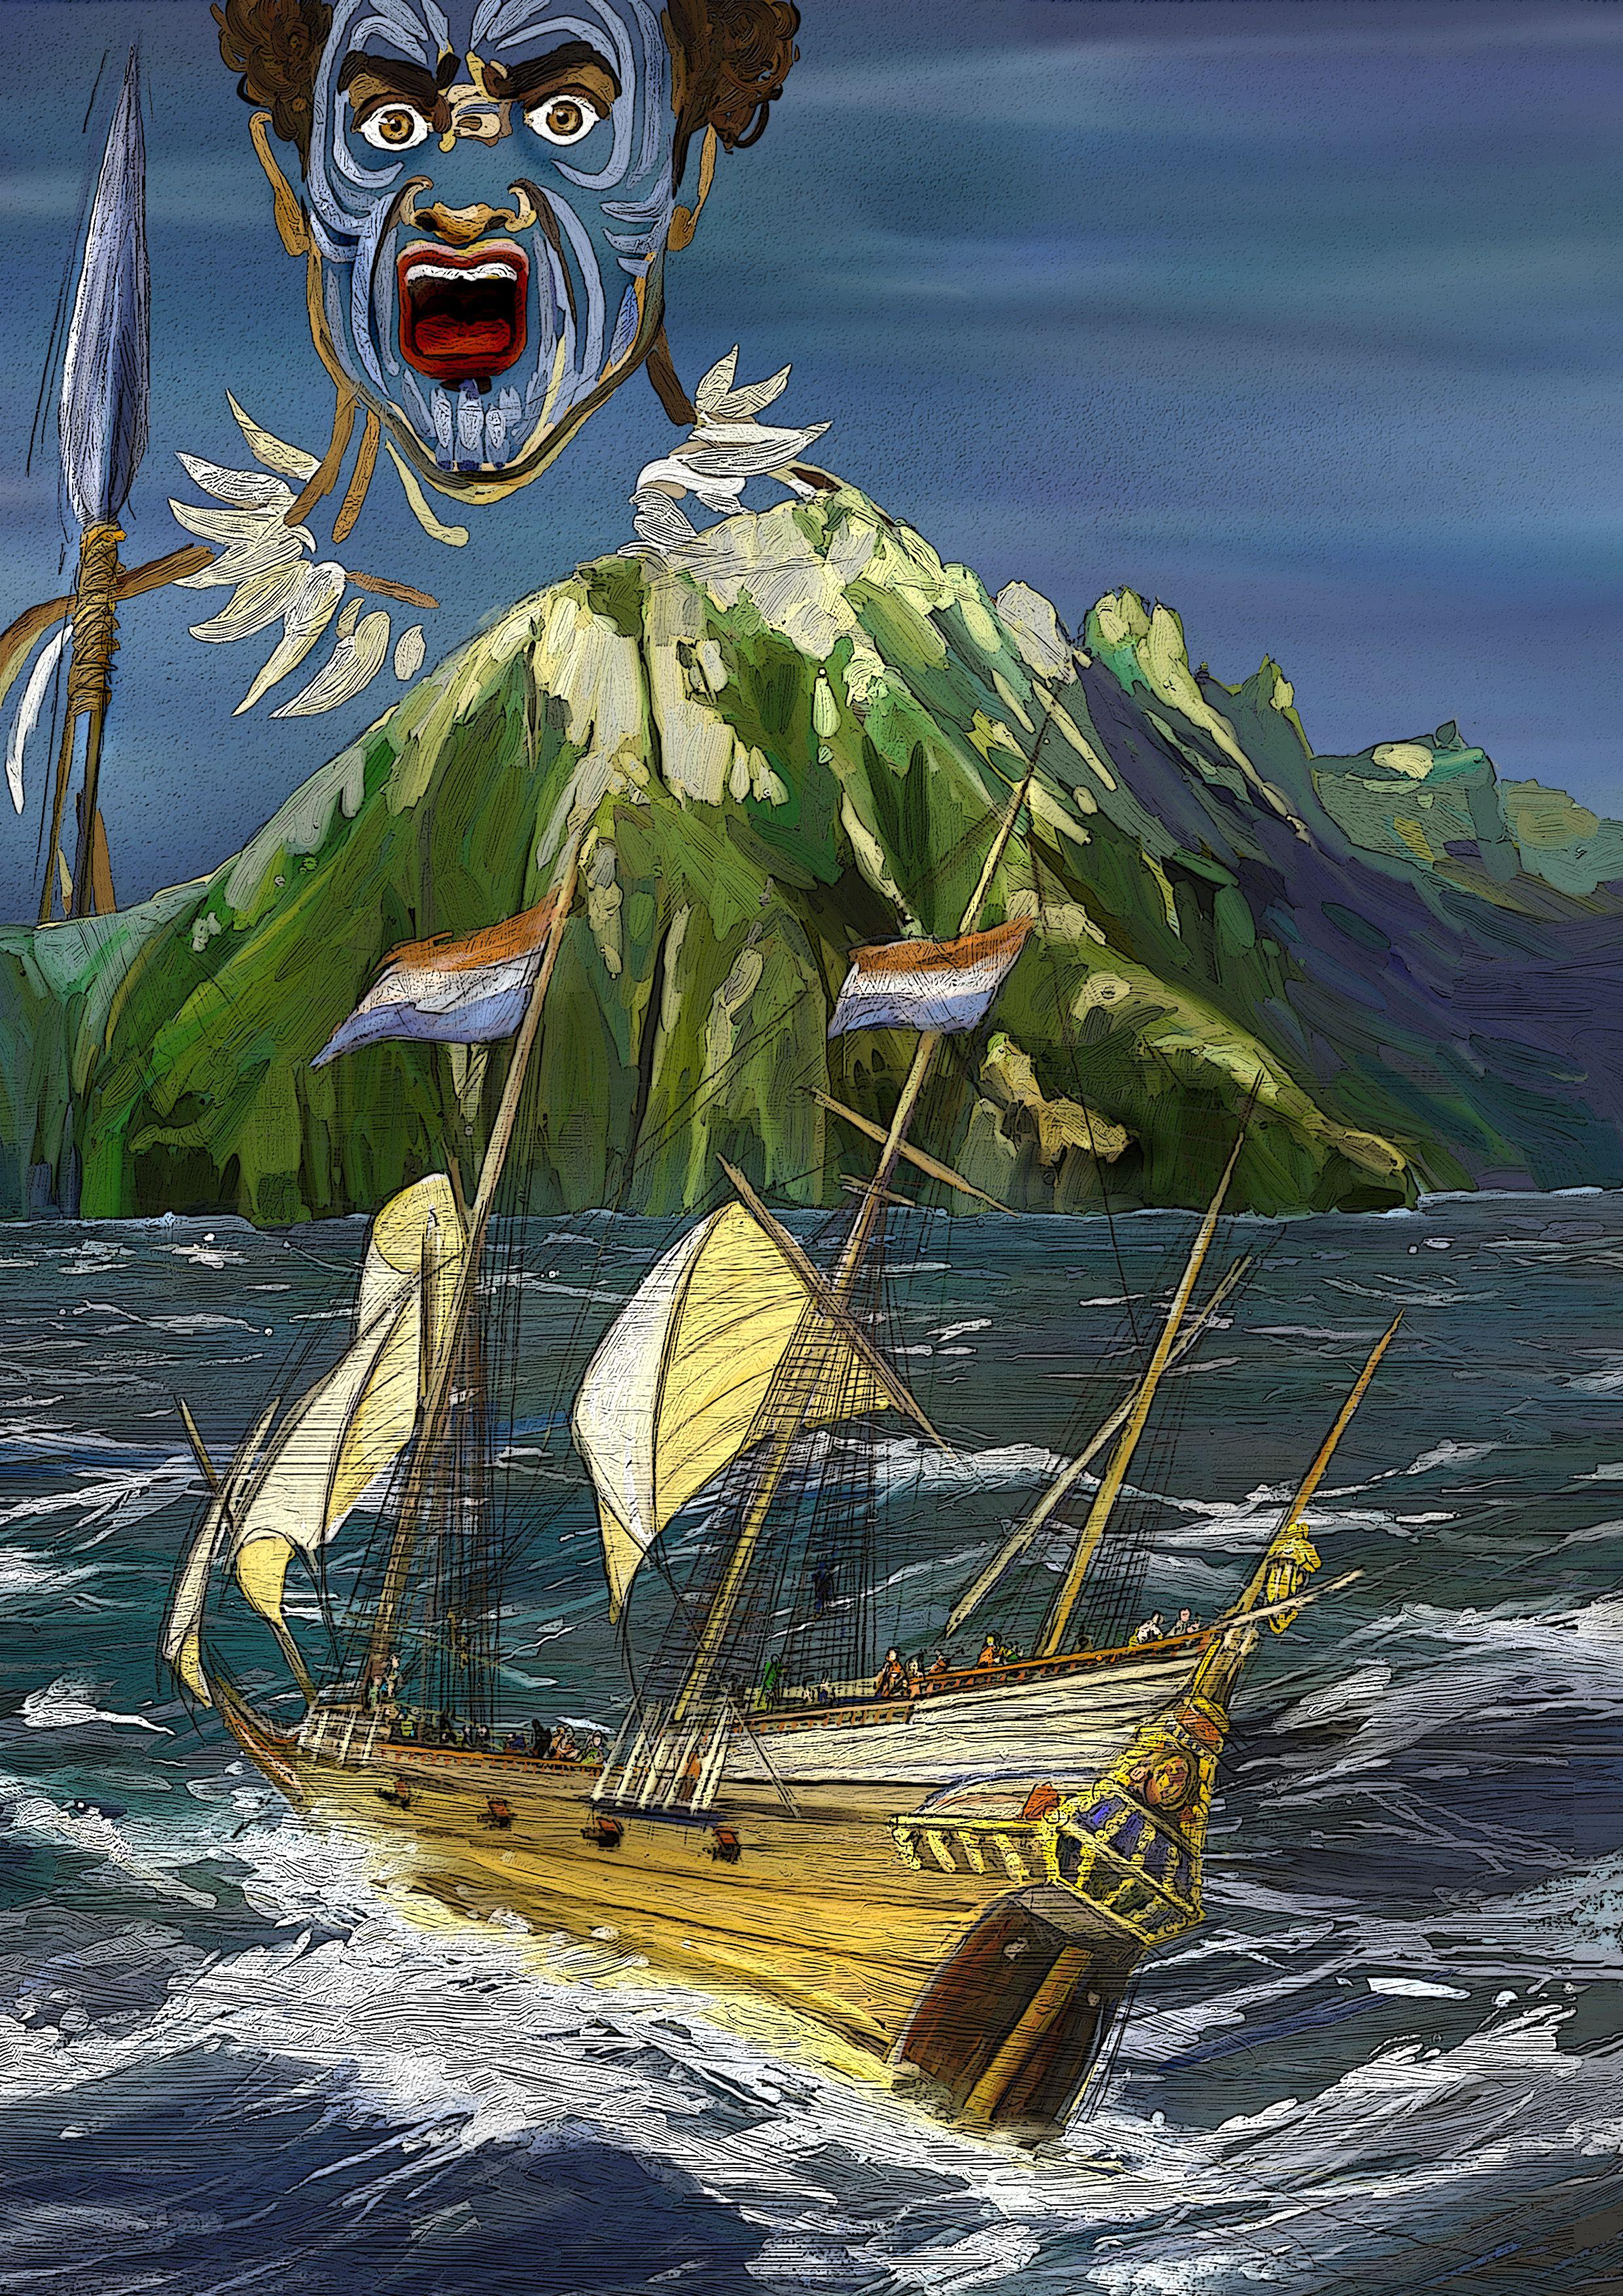 Coverillustration by Deborah Freriks. #capehorn #kaaphoorn #pacific #deborahfreriks #deborahfreriksillustraties